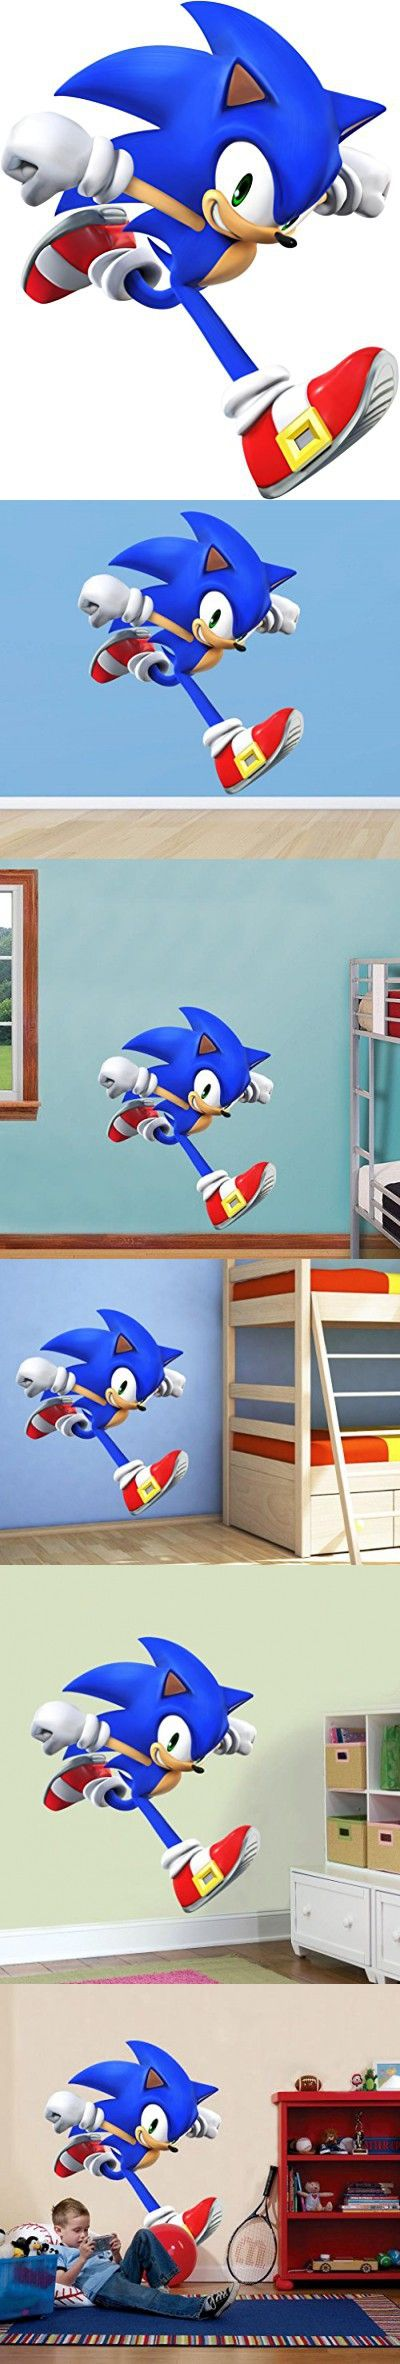 SONIC RUN Super Smash Bros Decal Removable WALL STICKER Home Decor Art Hedgehog